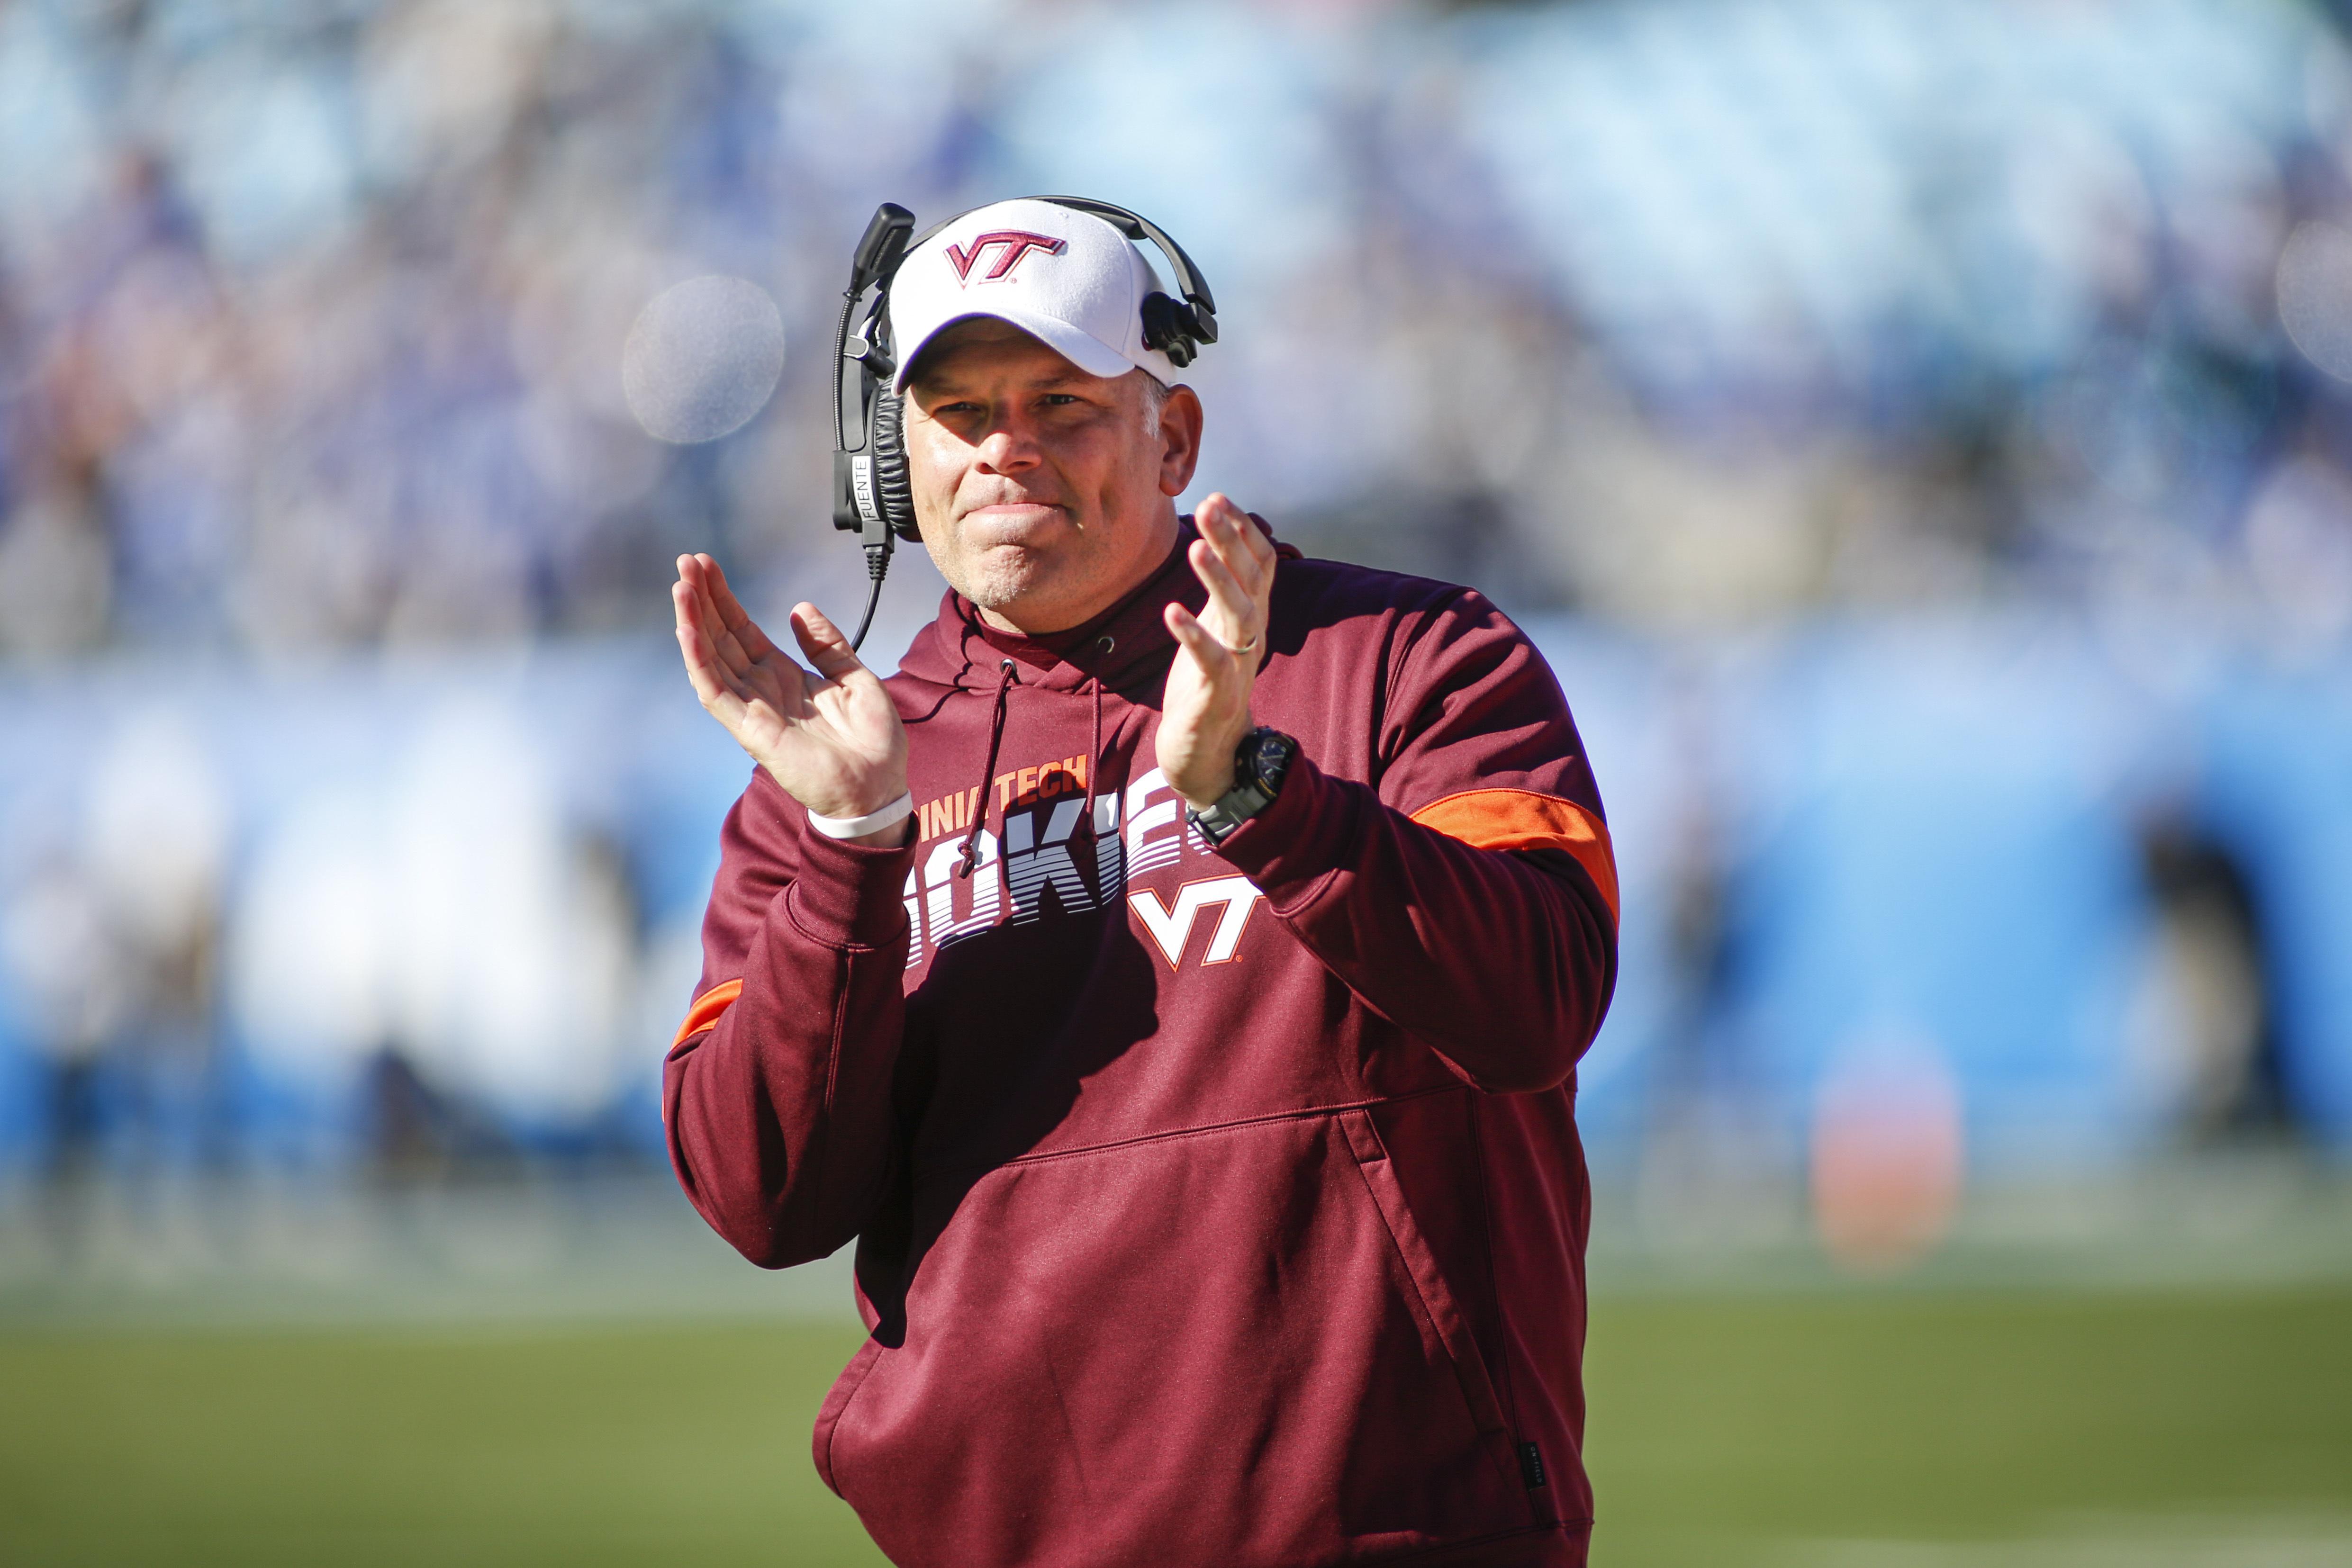 Virginia Tech Football Sees Increase In Coronavirus Cases The Washington Post